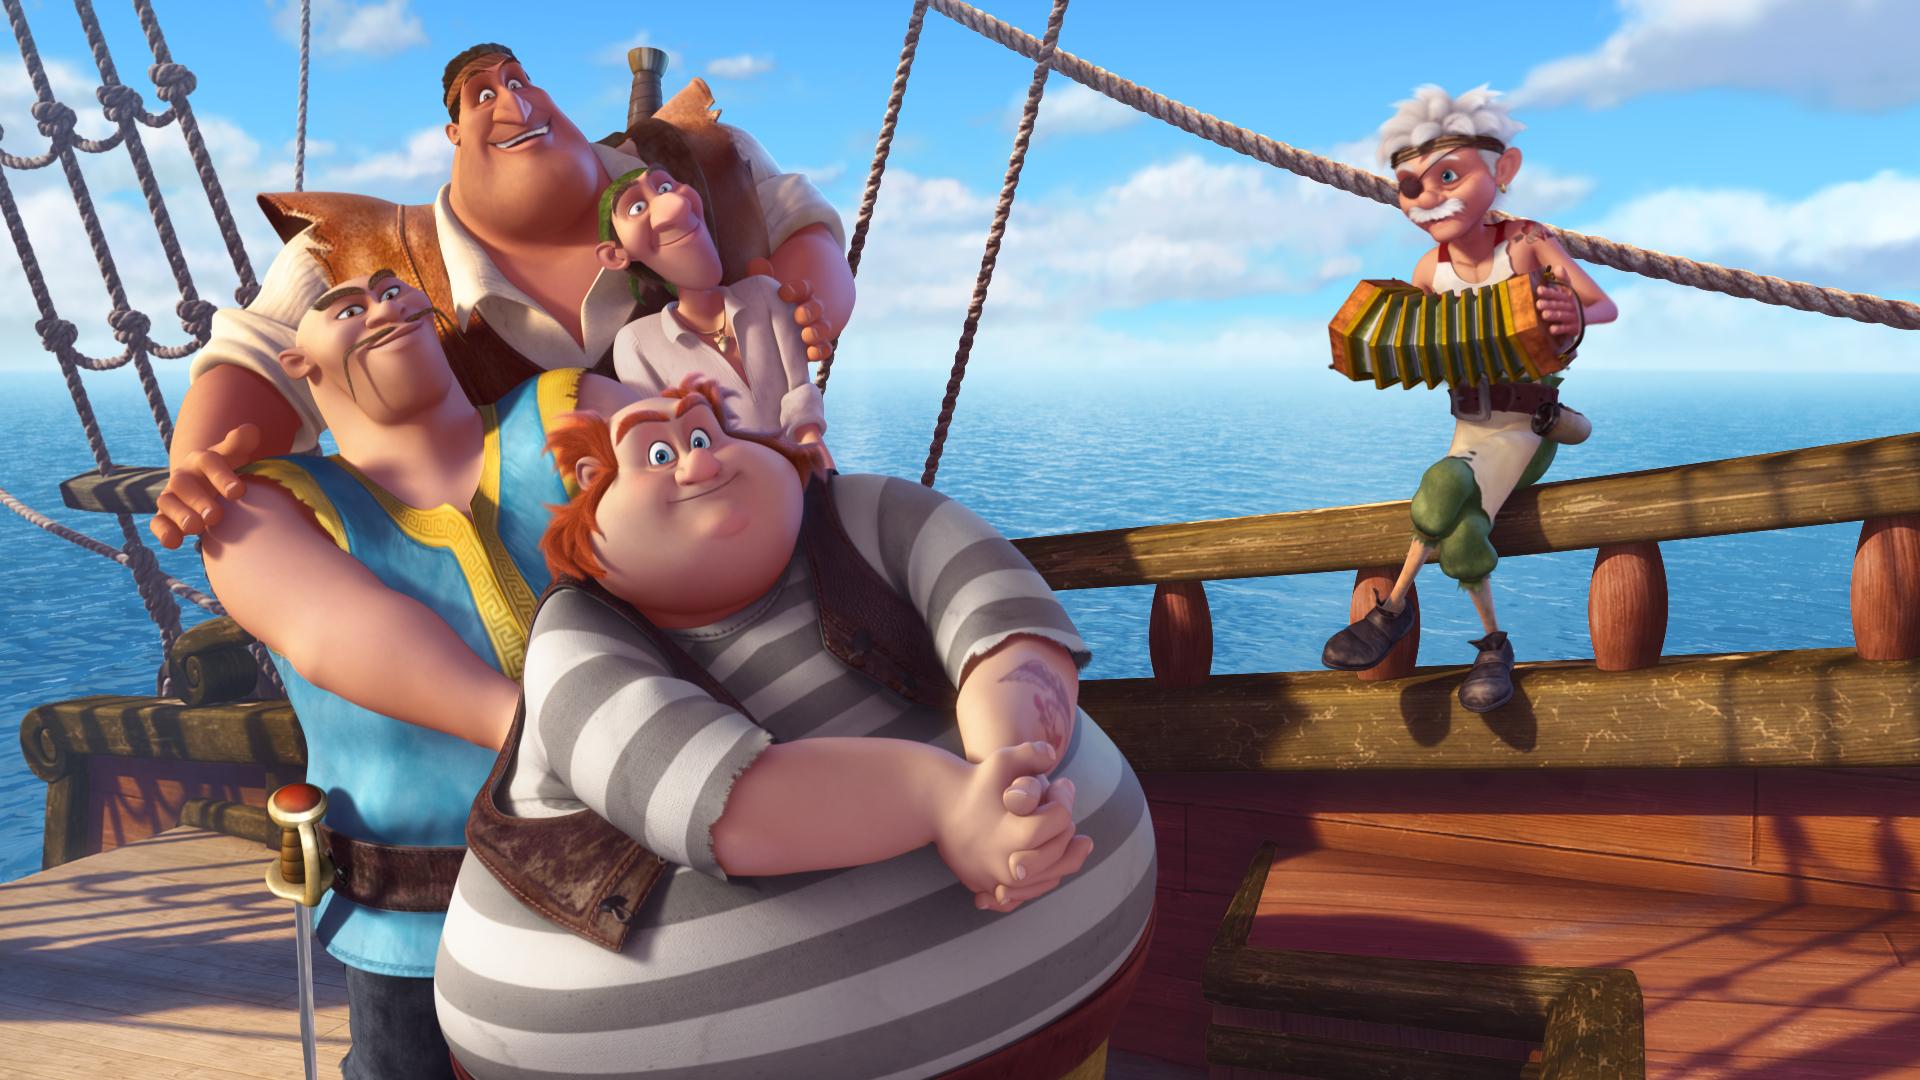 Pirate Crew (The Pirate Fairy)